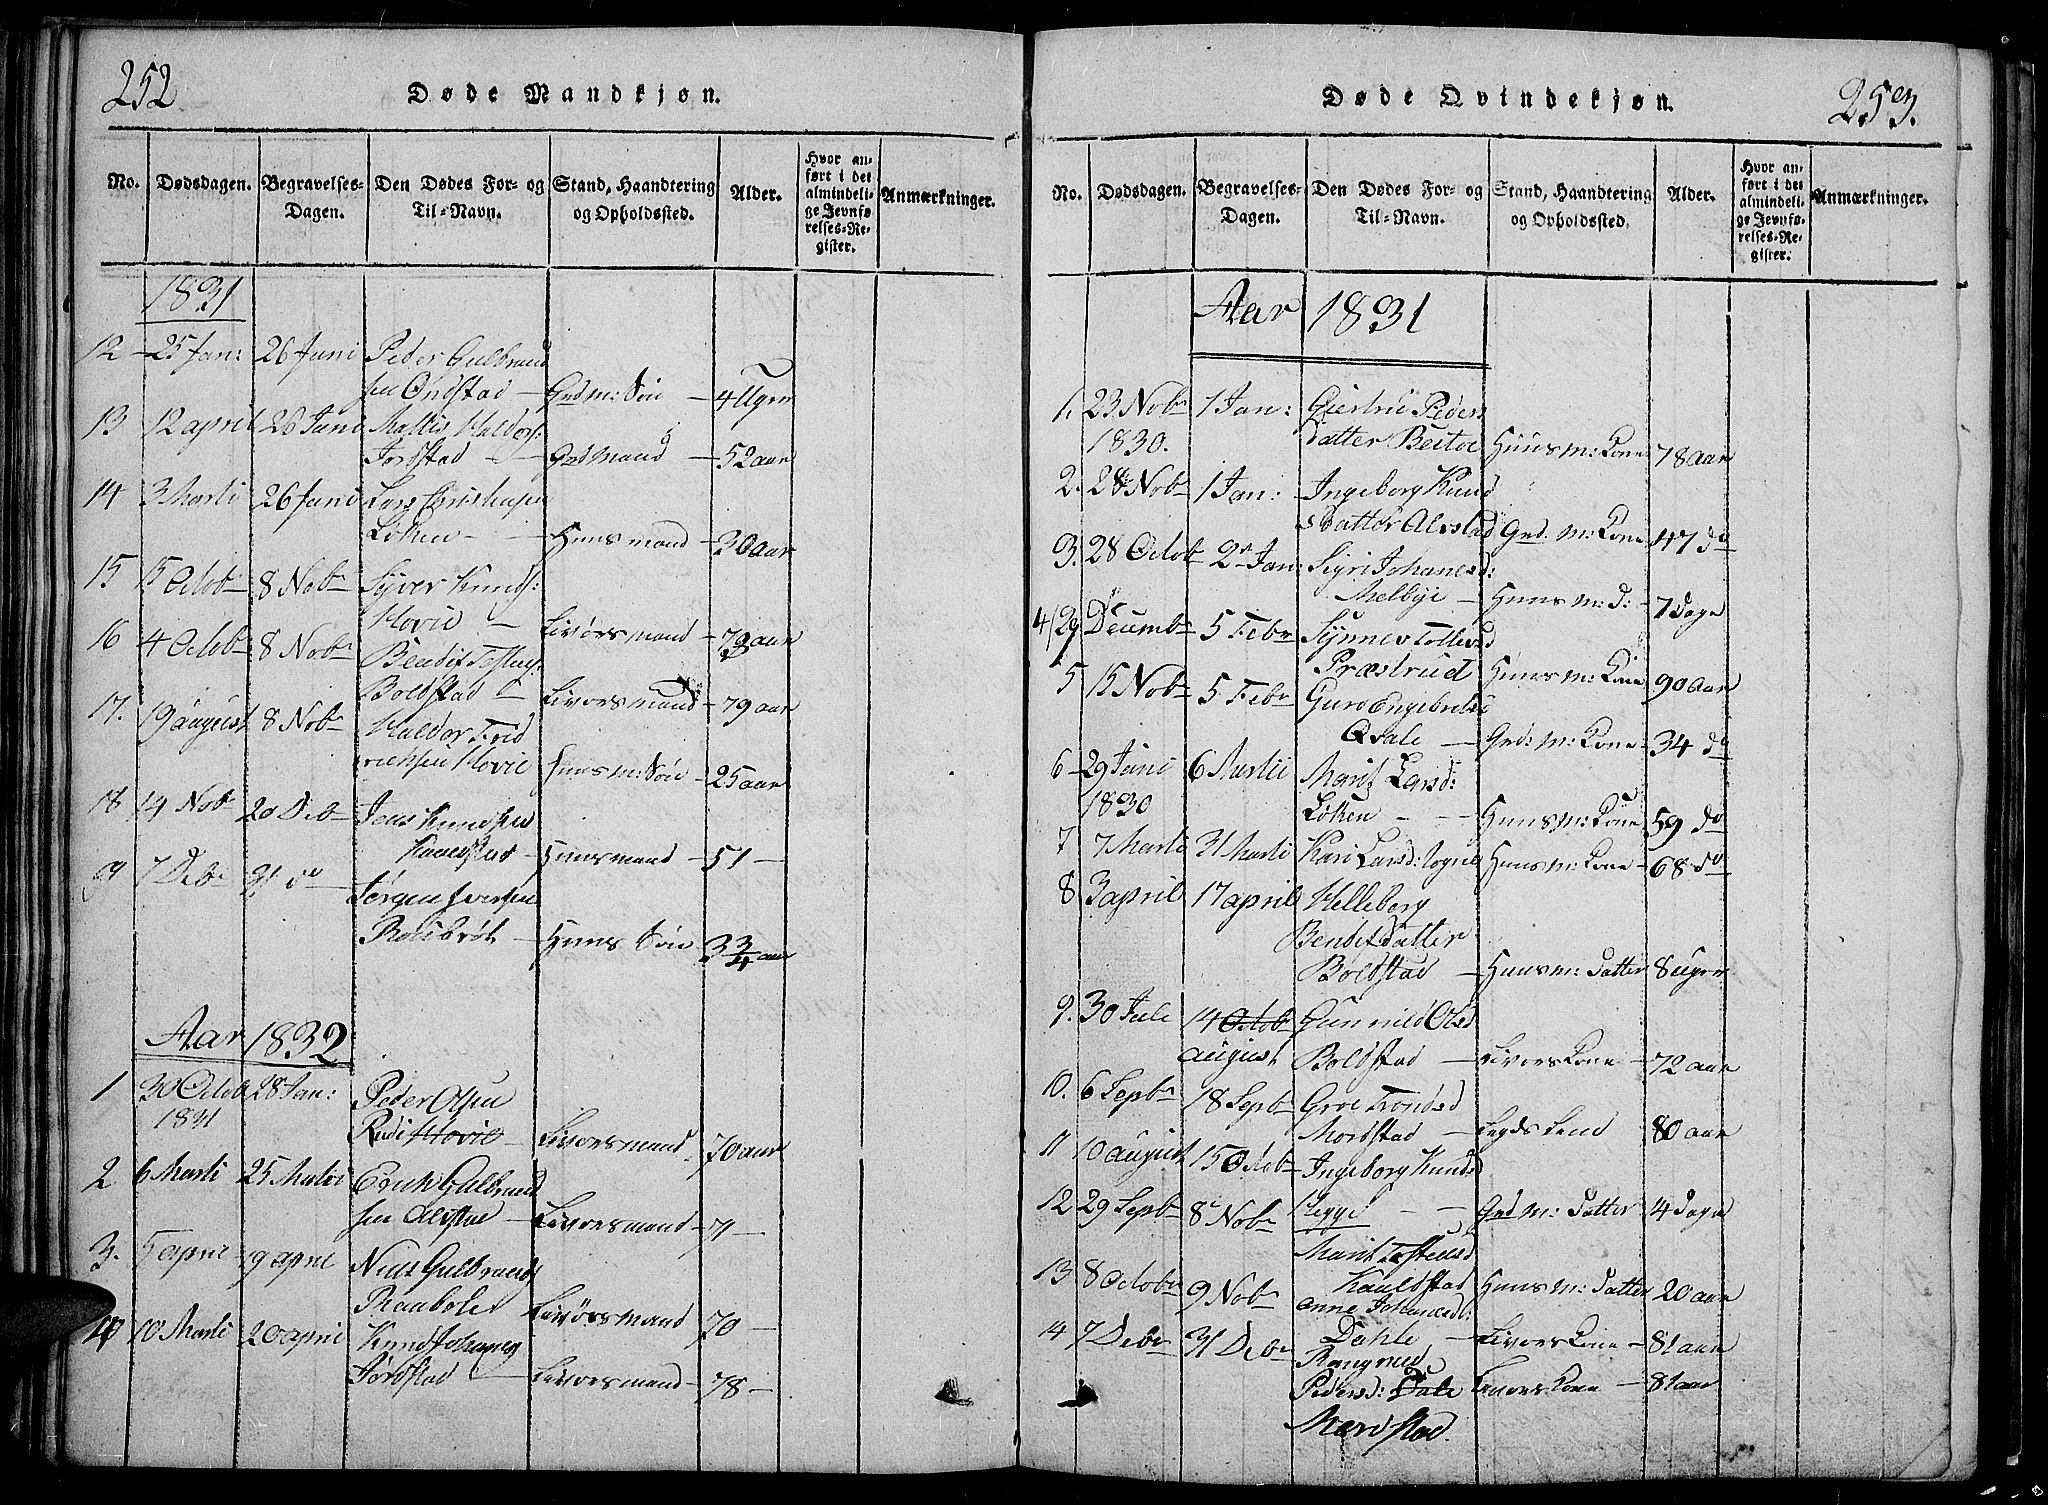 SAH, Slidre prestekontor, Klokkerbok nr. 2, 1814-1839, s. 252-253